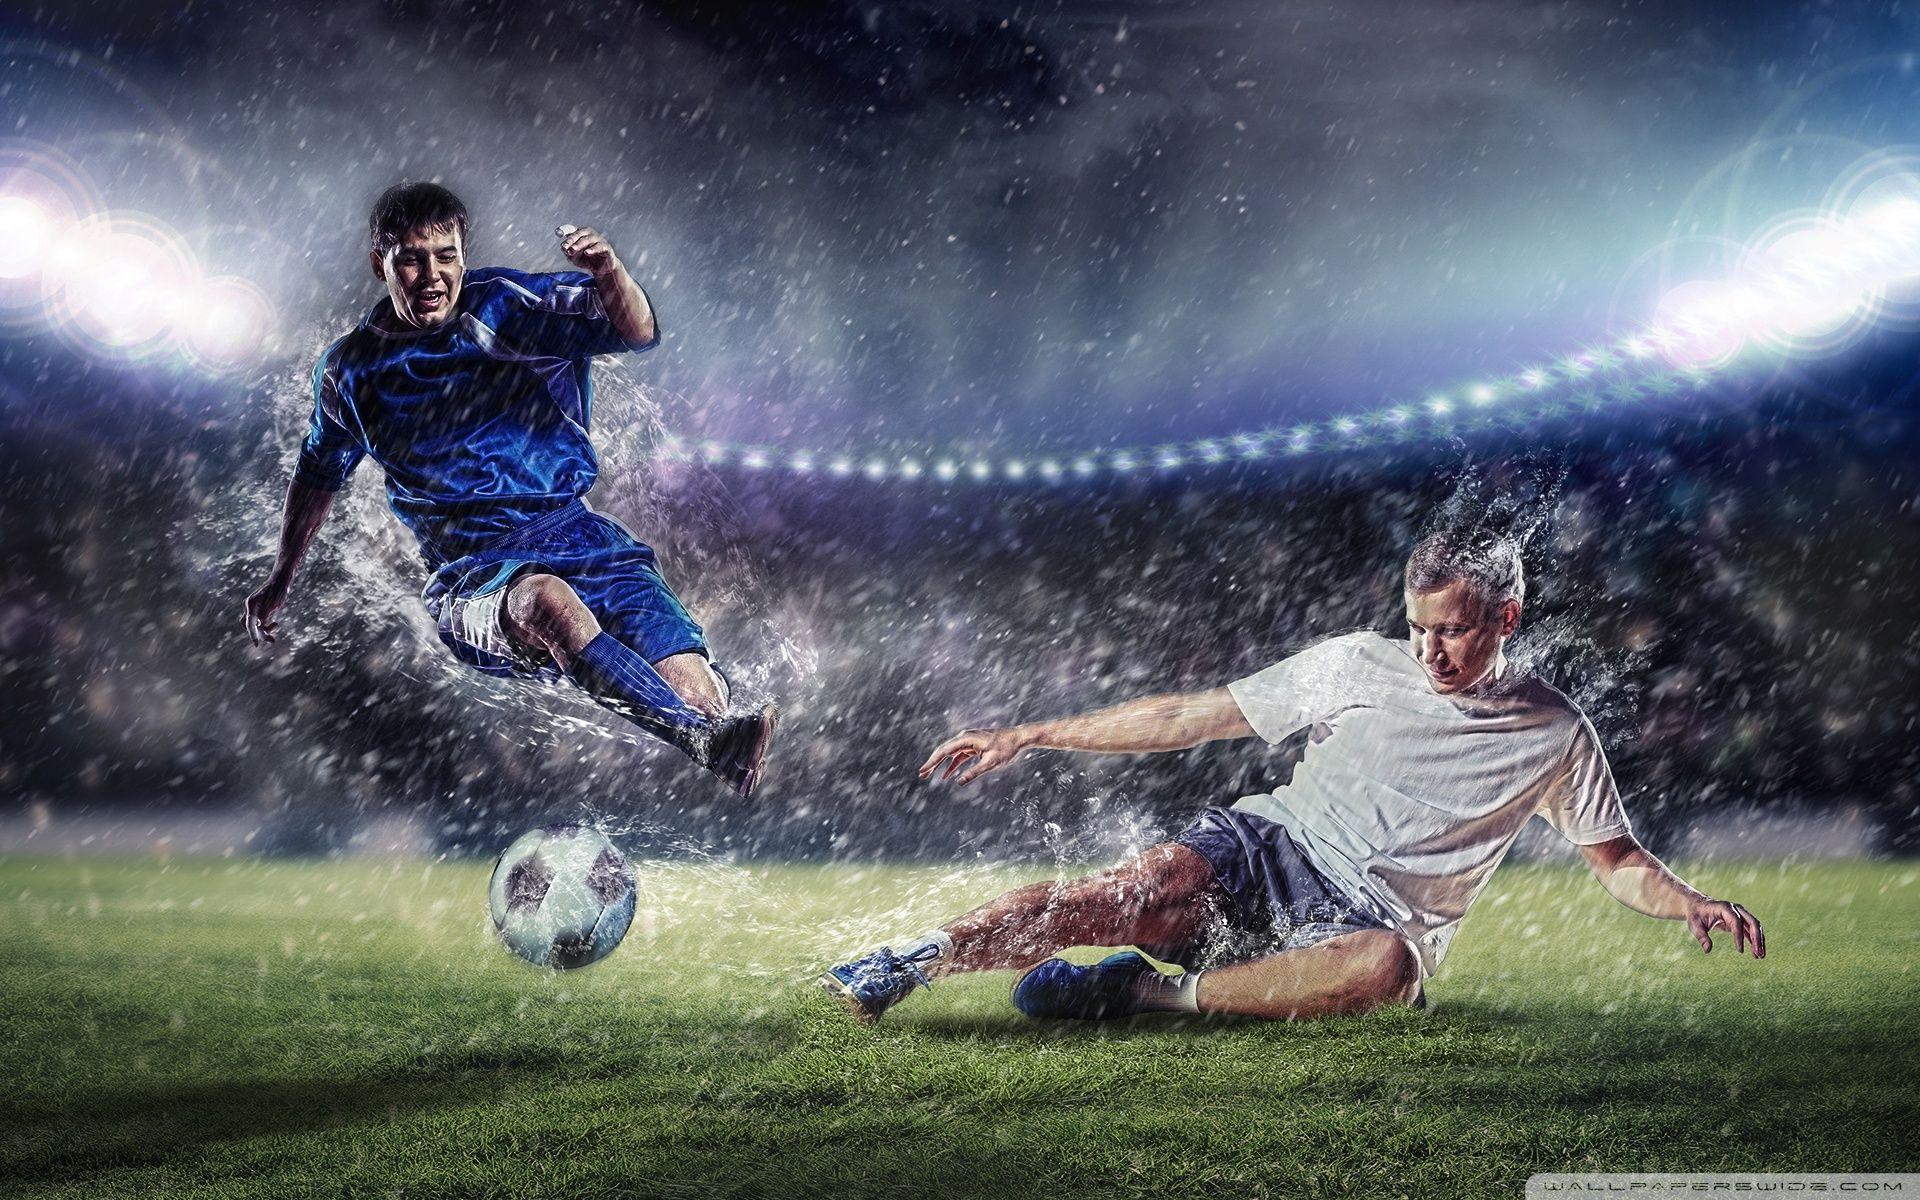 Download Wallpaper High Quality Football - e485ec4997c10196f1e492cc74a1bb8f  Snapshot_13877.jpg